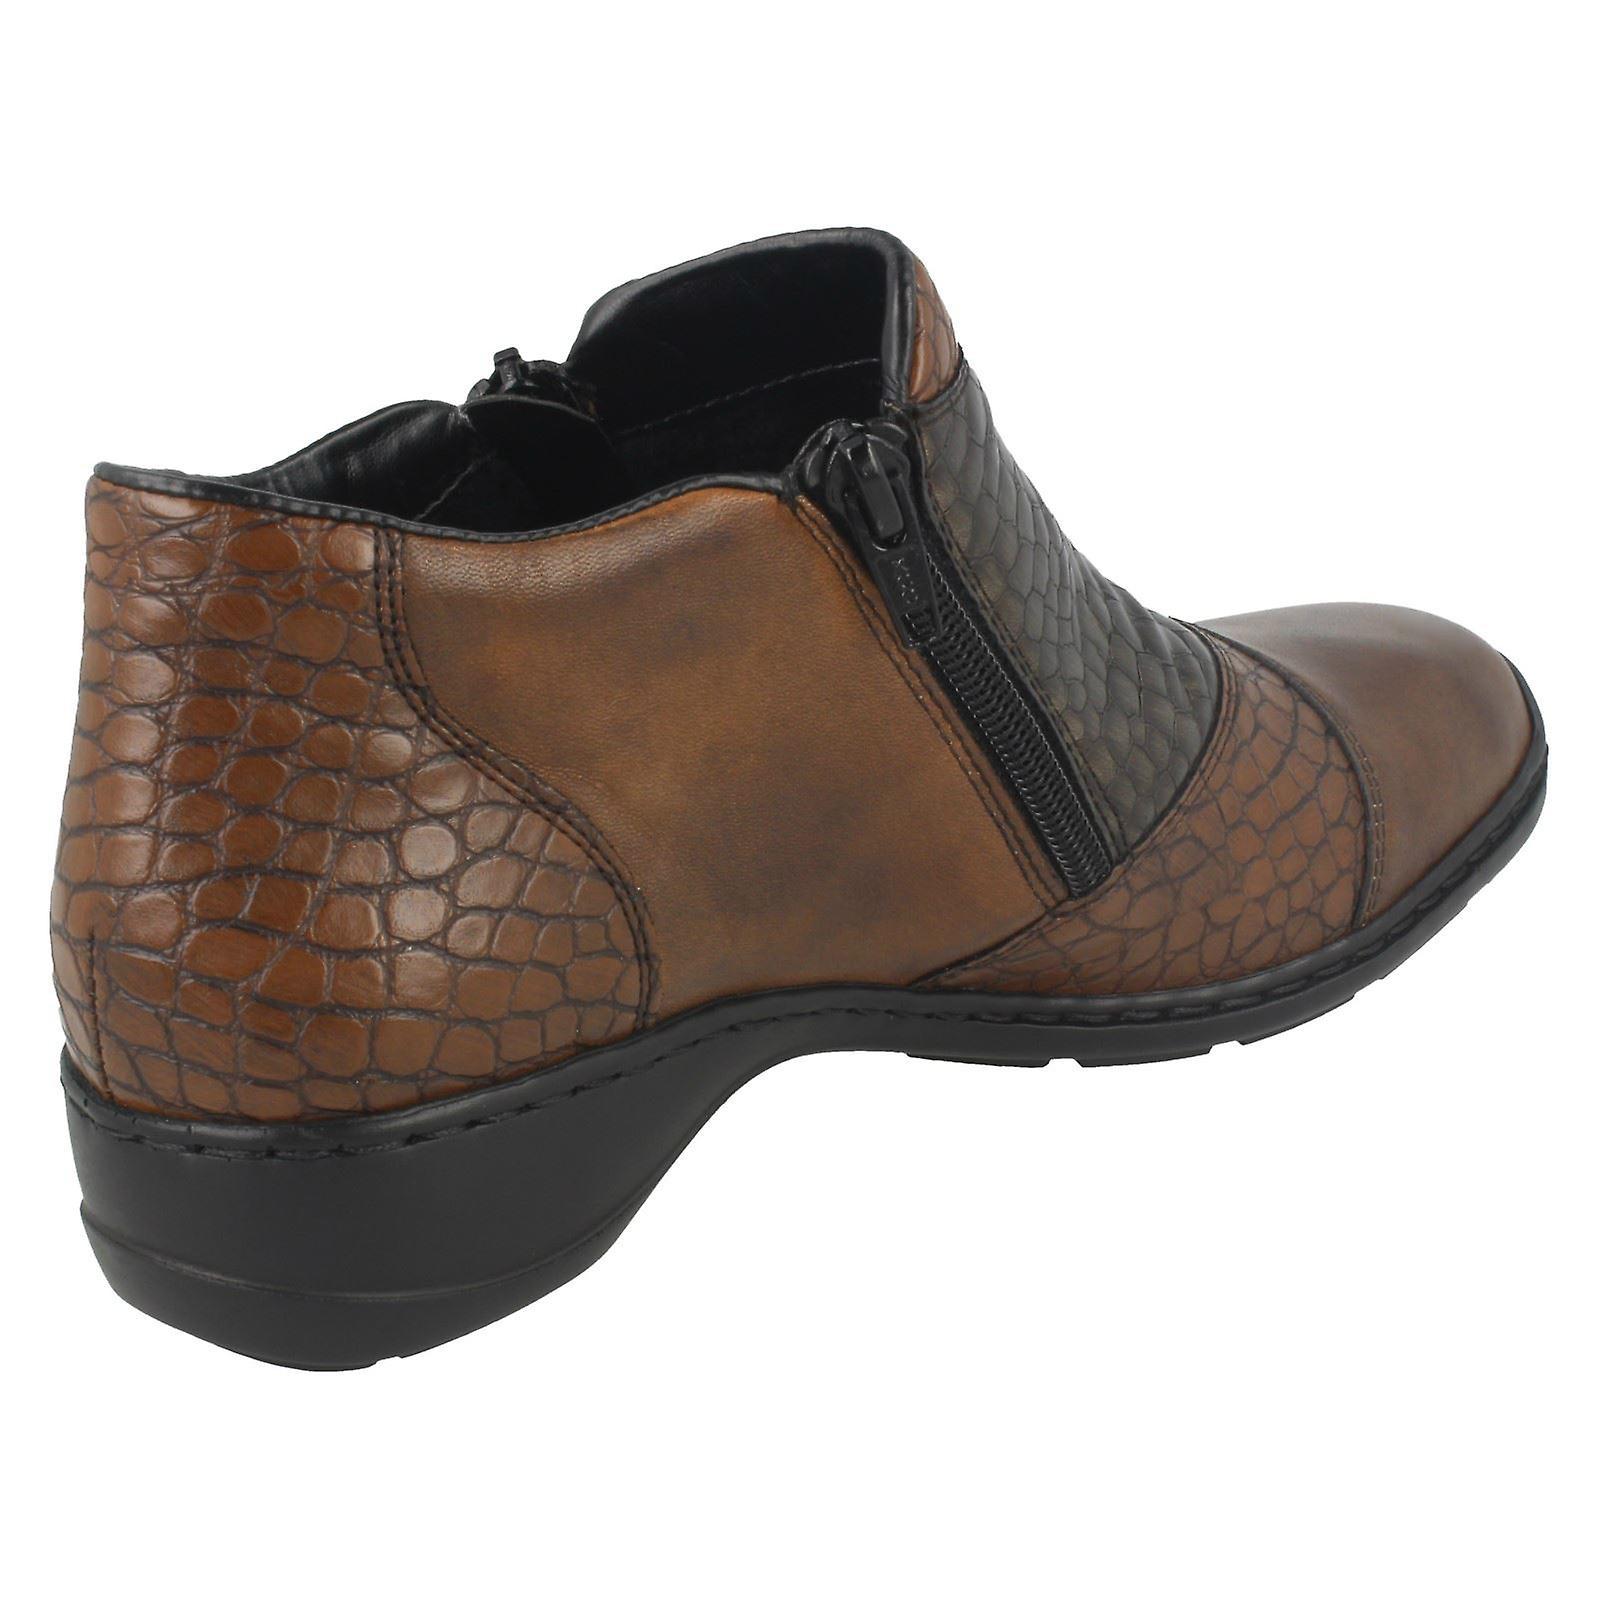 Ladies Rieker Double Zip Ankle Boots 58359